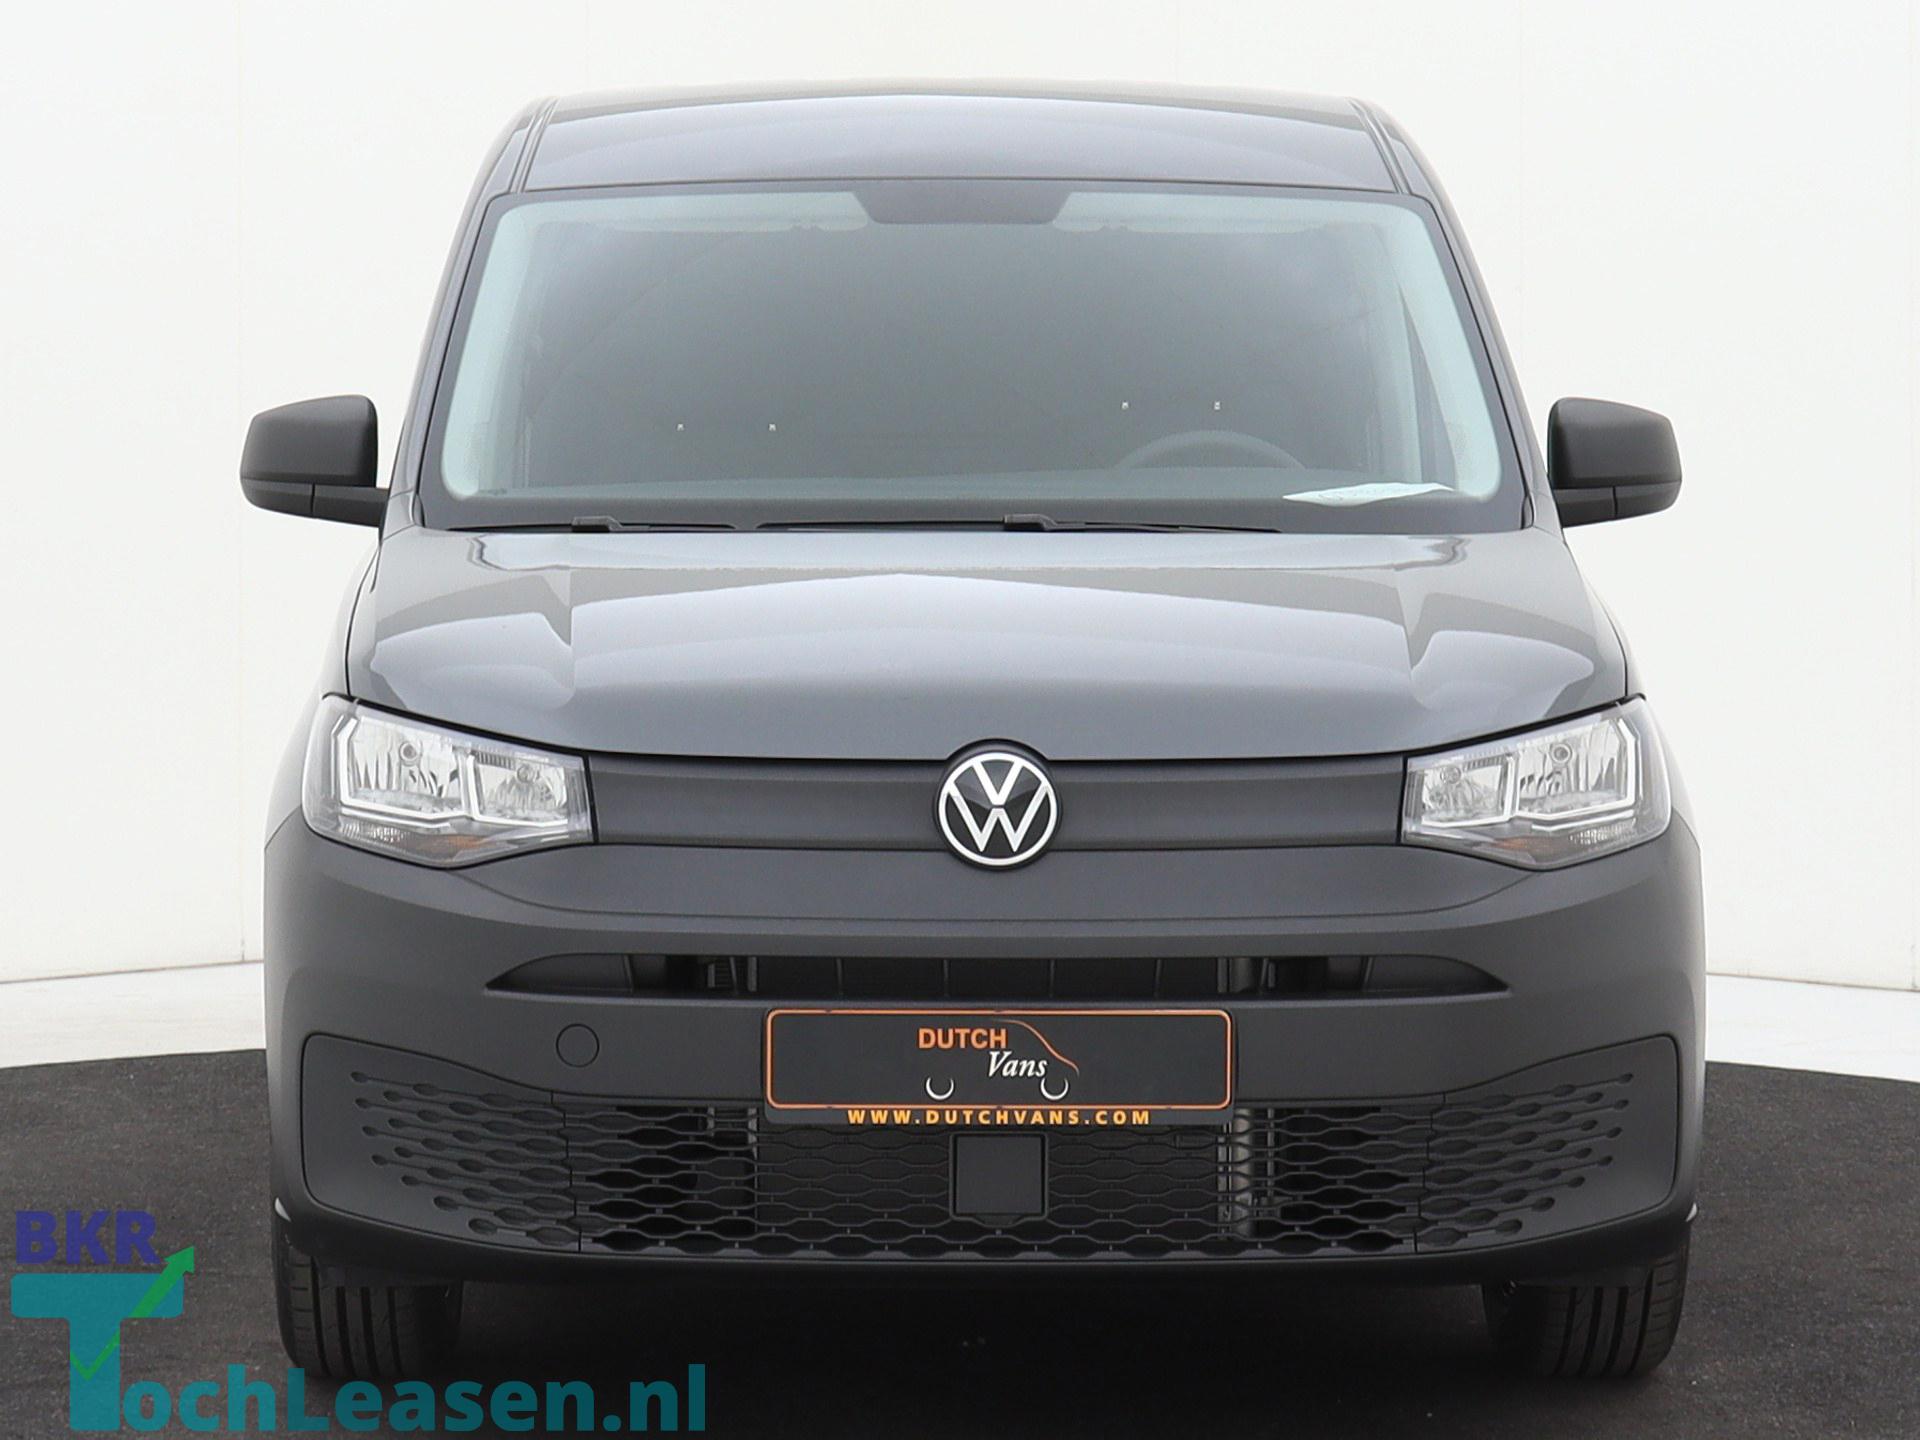 BKR toch leasen - Volkswagen Caddy - Grijs 5